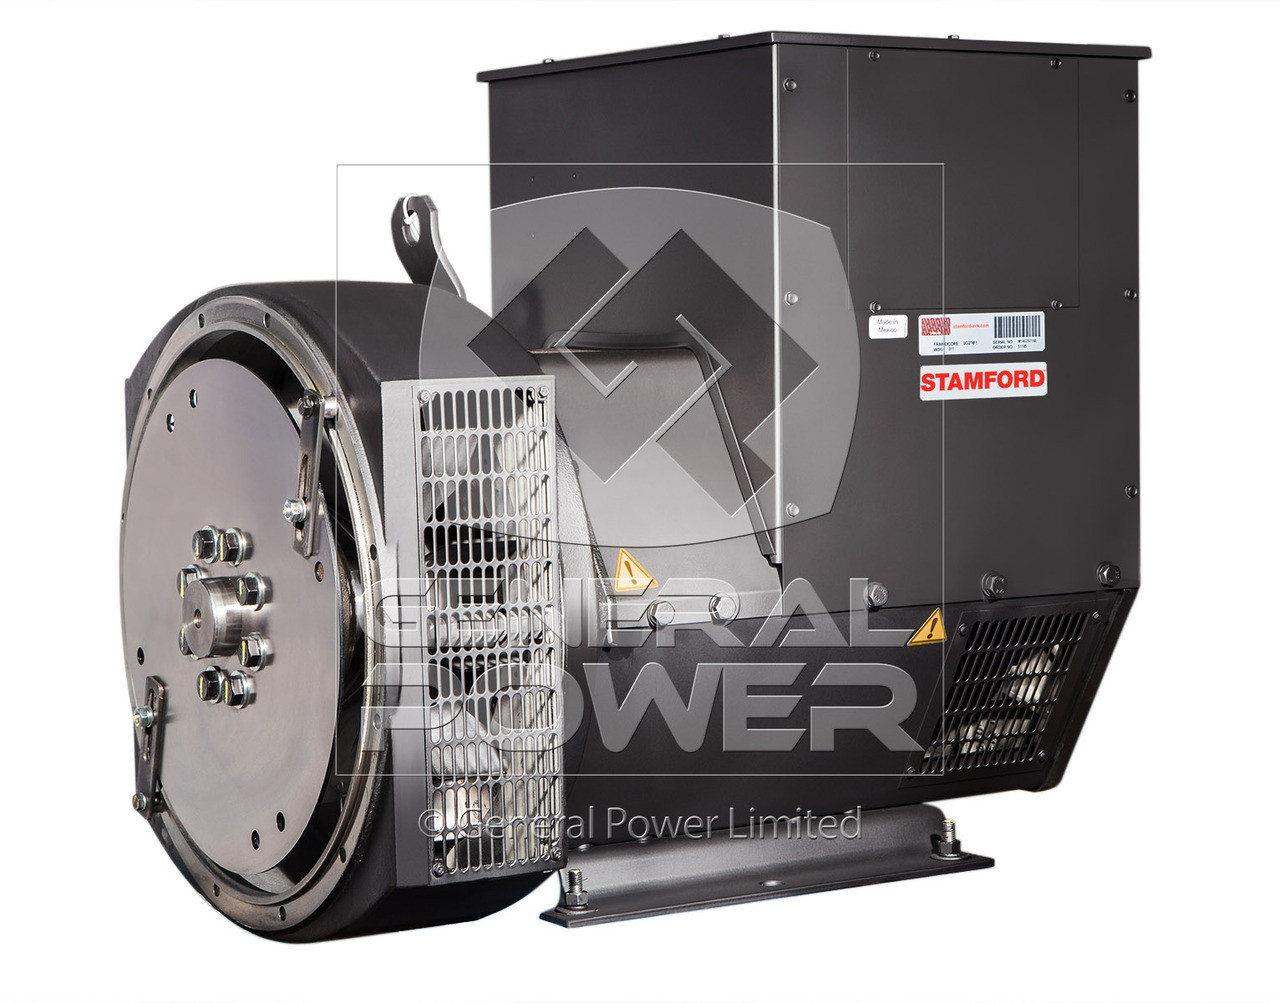 Stamford Hci544f Alternator Cummins Generator Newage Wiring Diagram Photo 700 Kw 875 Kva 3 Phase Loading Zoom